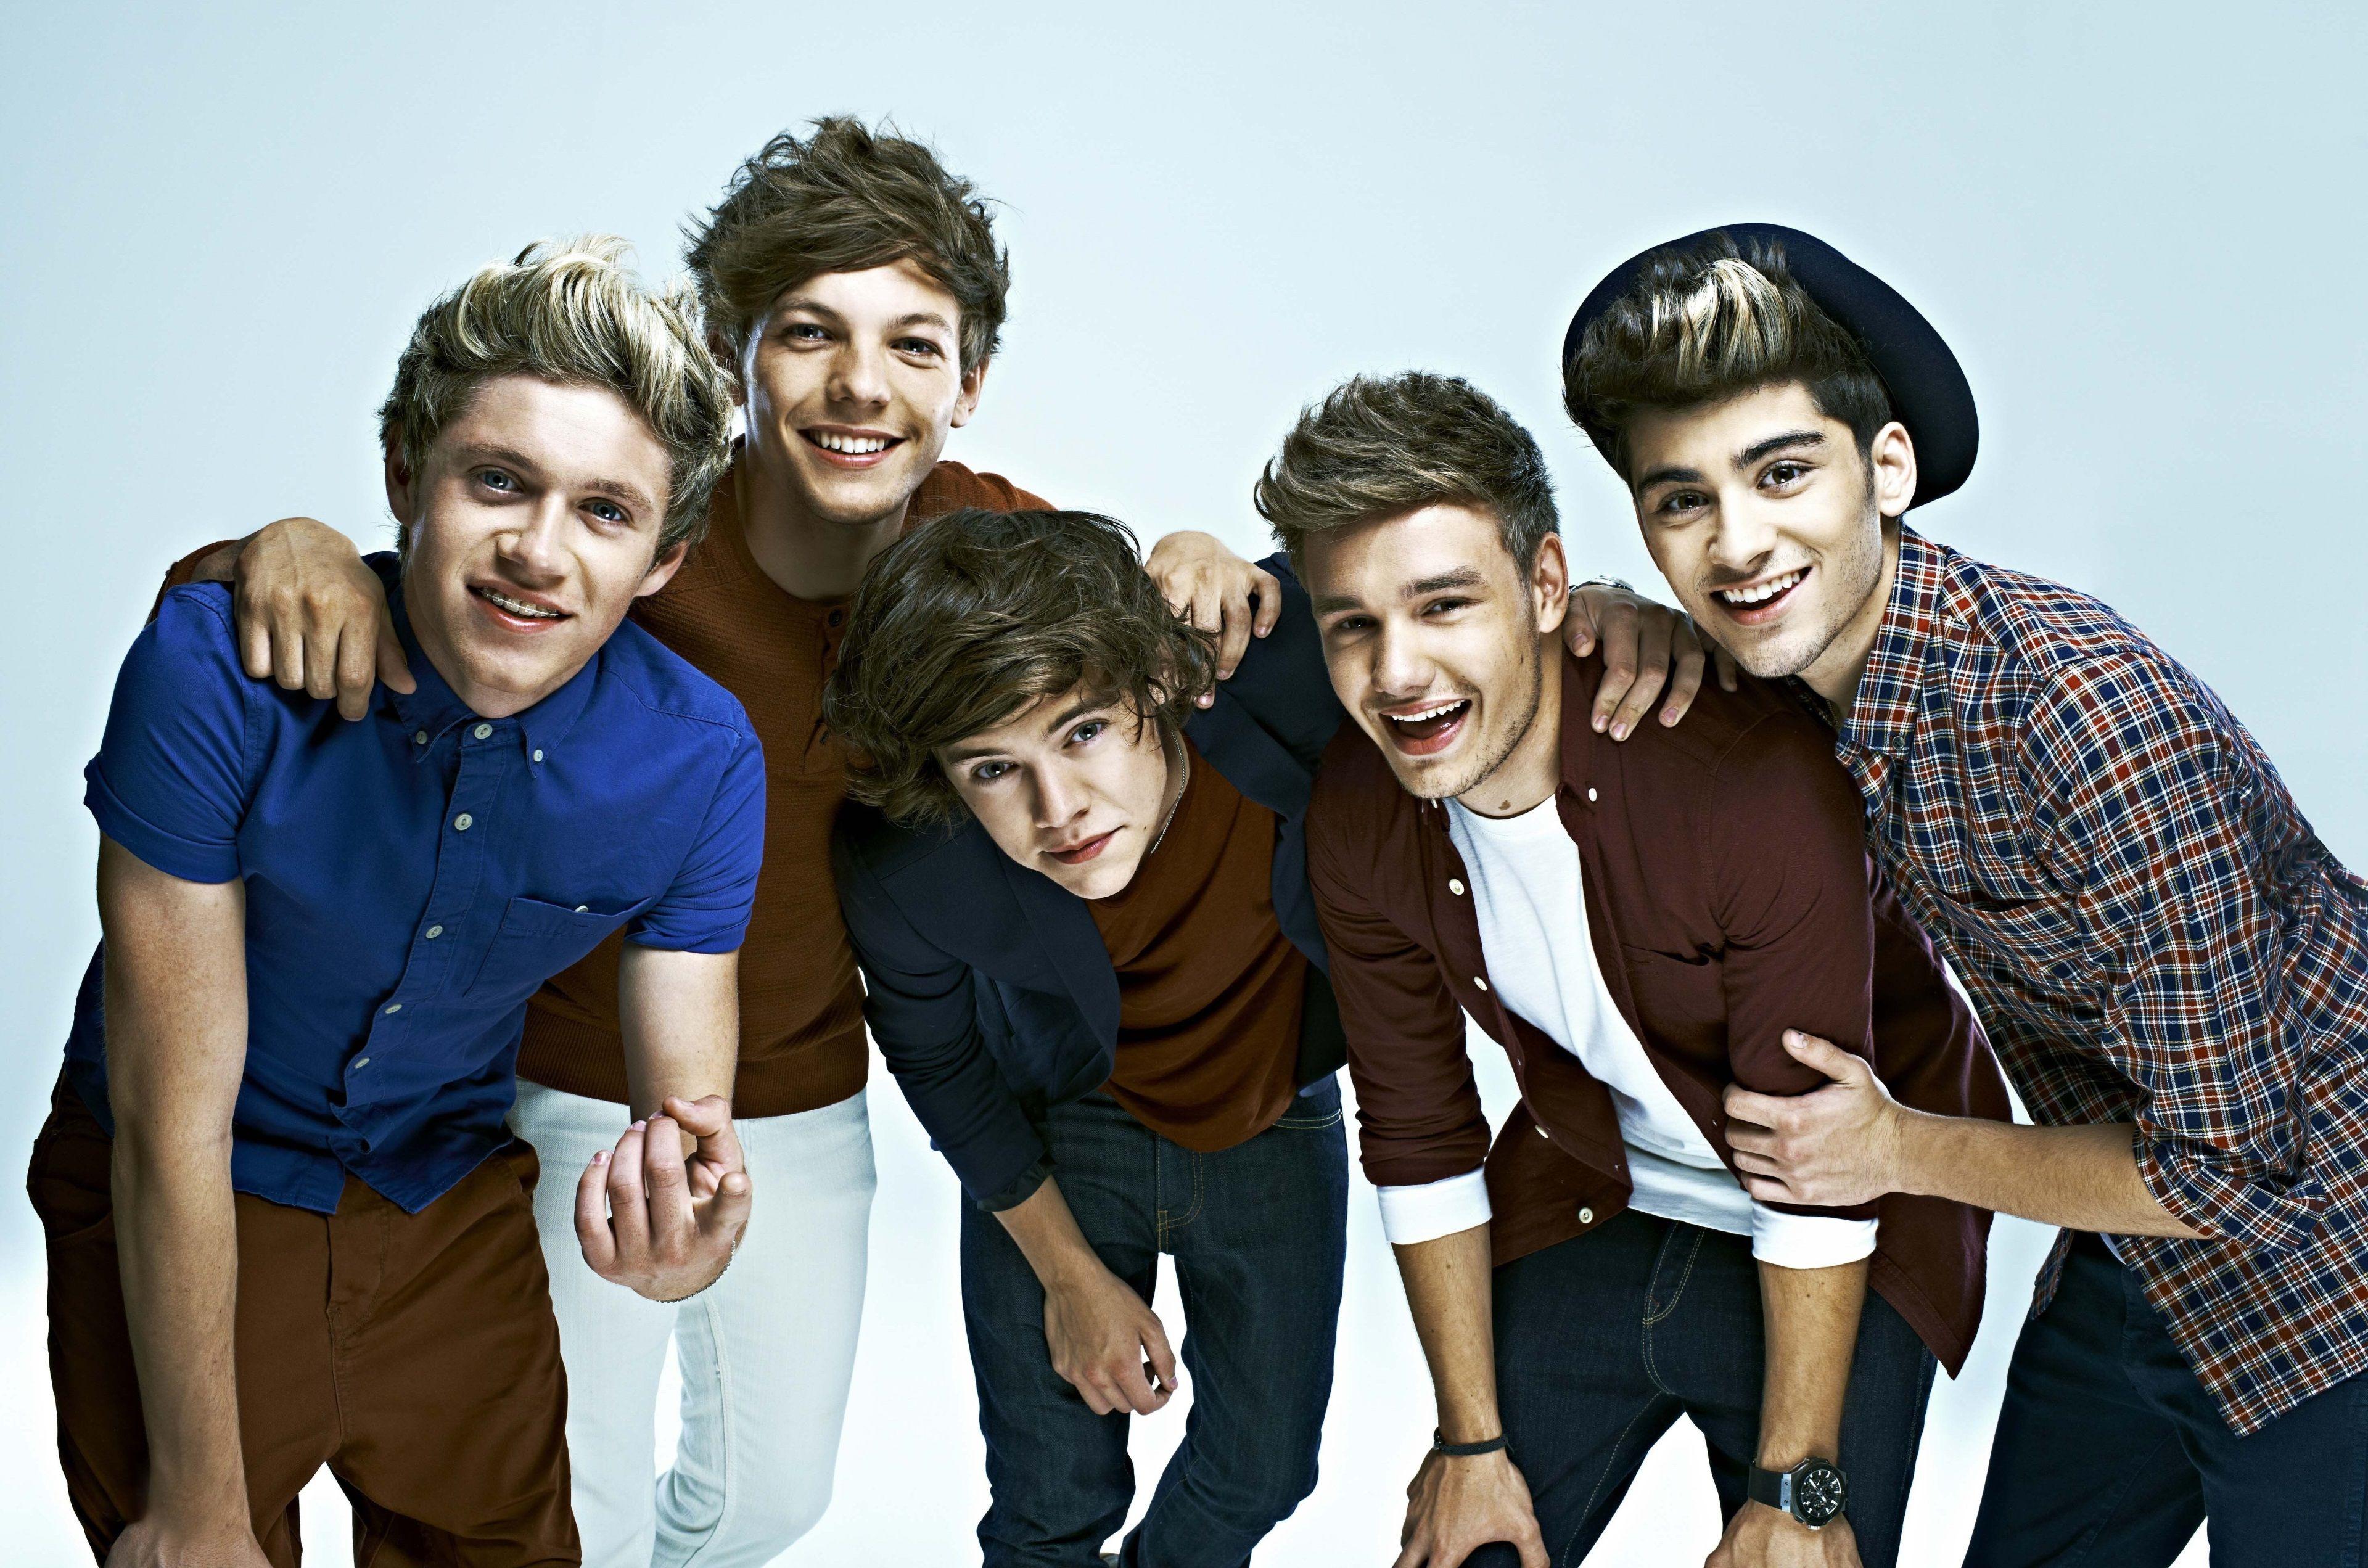 3840x2543 One Direction 4k Hi Def Desktop Wallpaper One Direction Tweets Members Of One Direction I Love One Direction